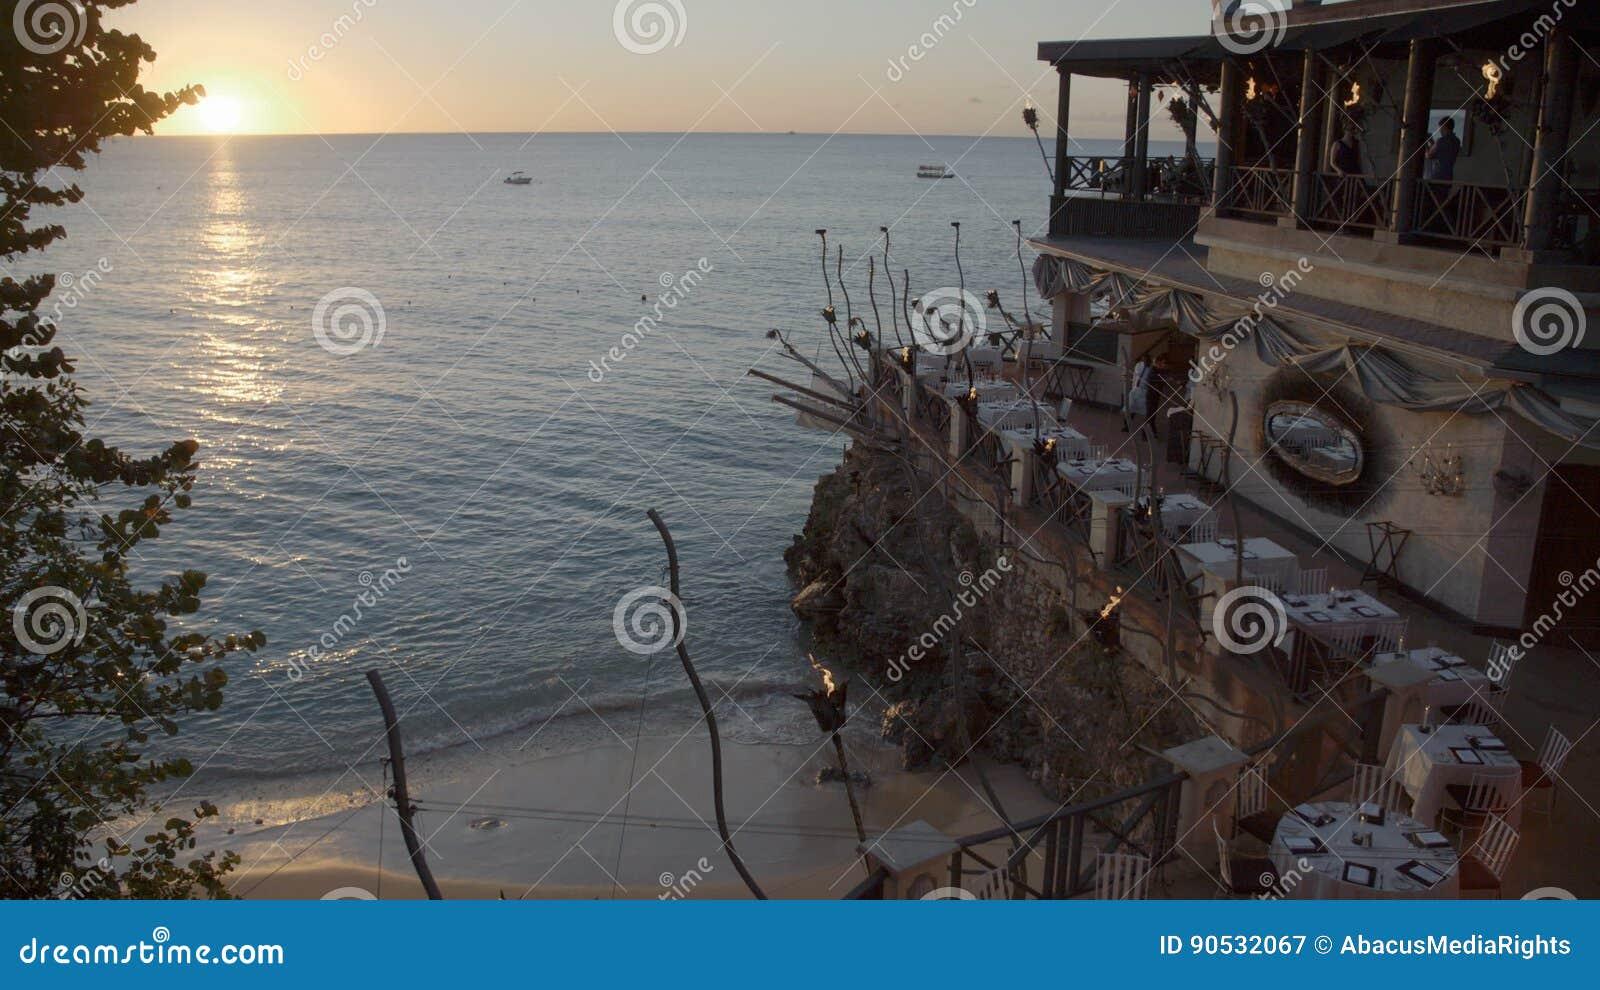 Fancy Restaurant On A Beach Stock Video Video Of Serve Dinner 90532067